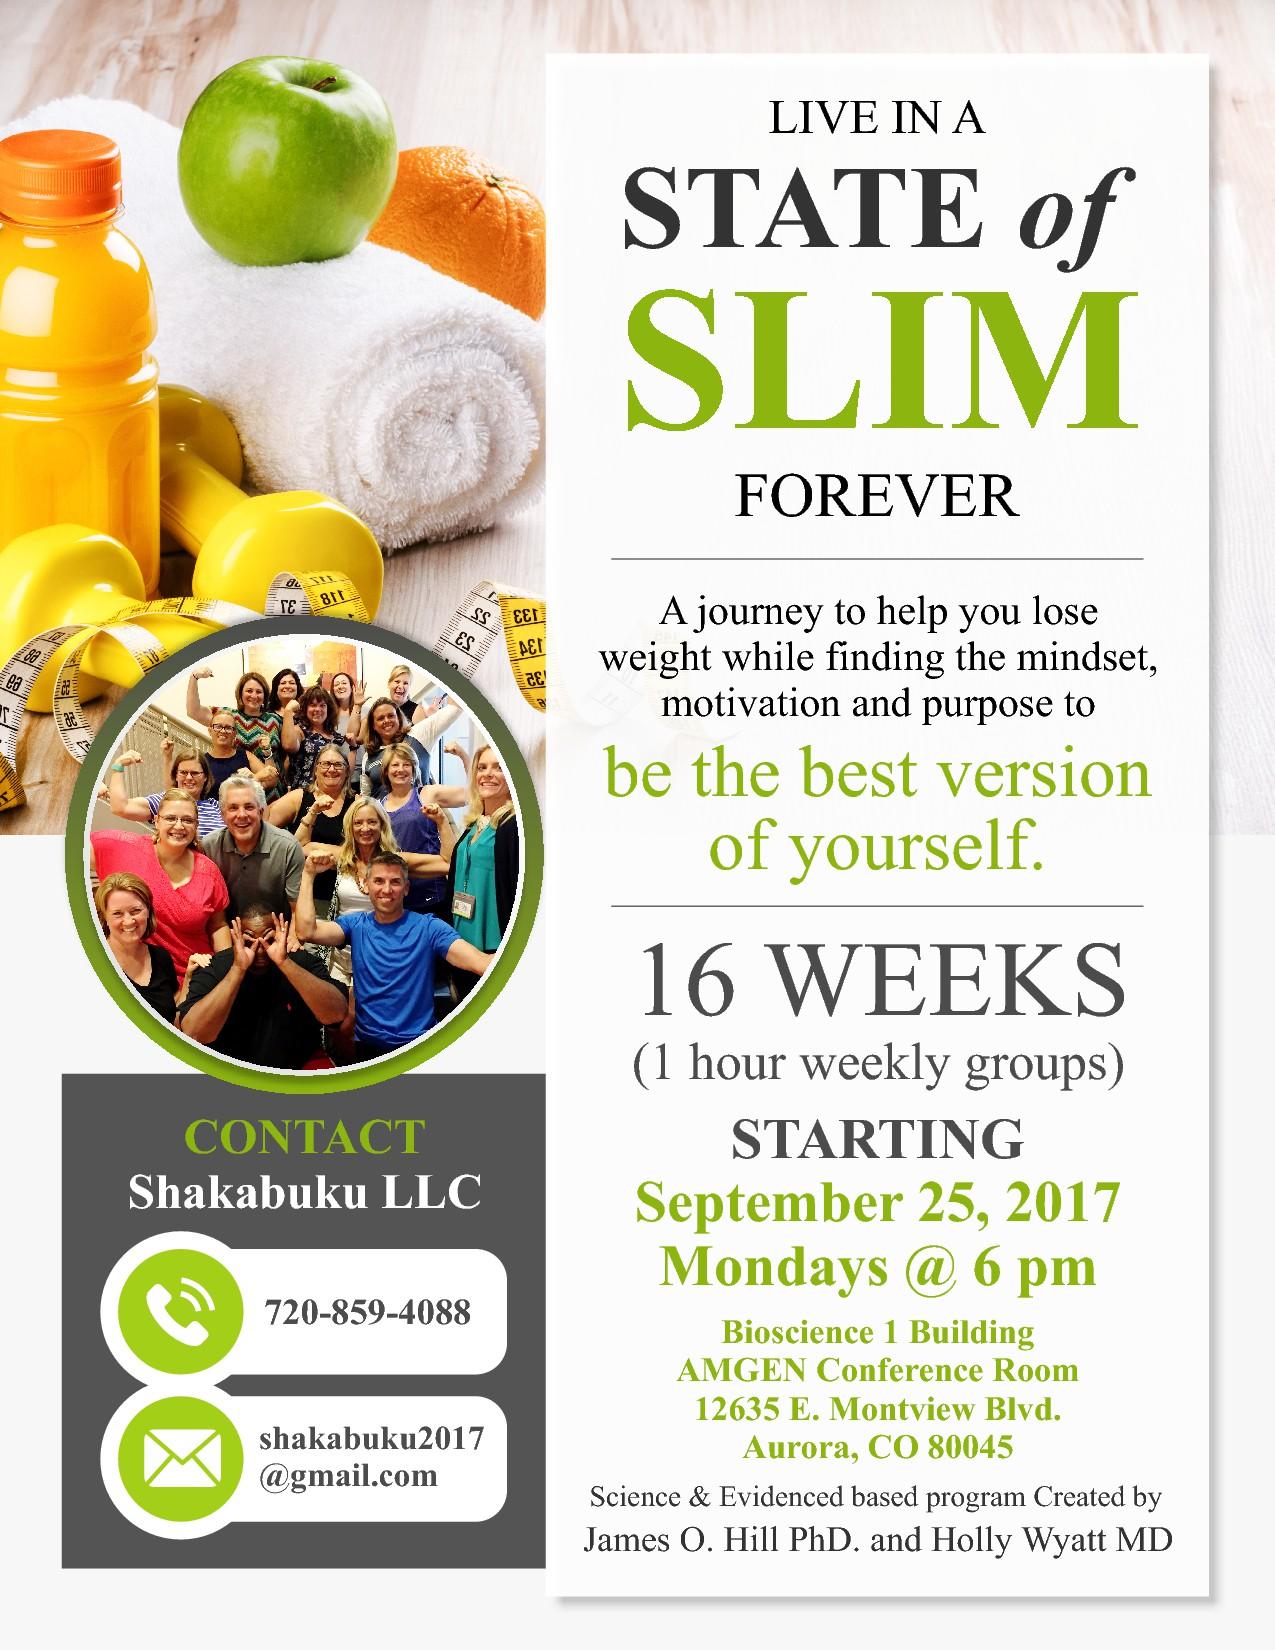 Shakabuku and State of Slim need a motivational flyer